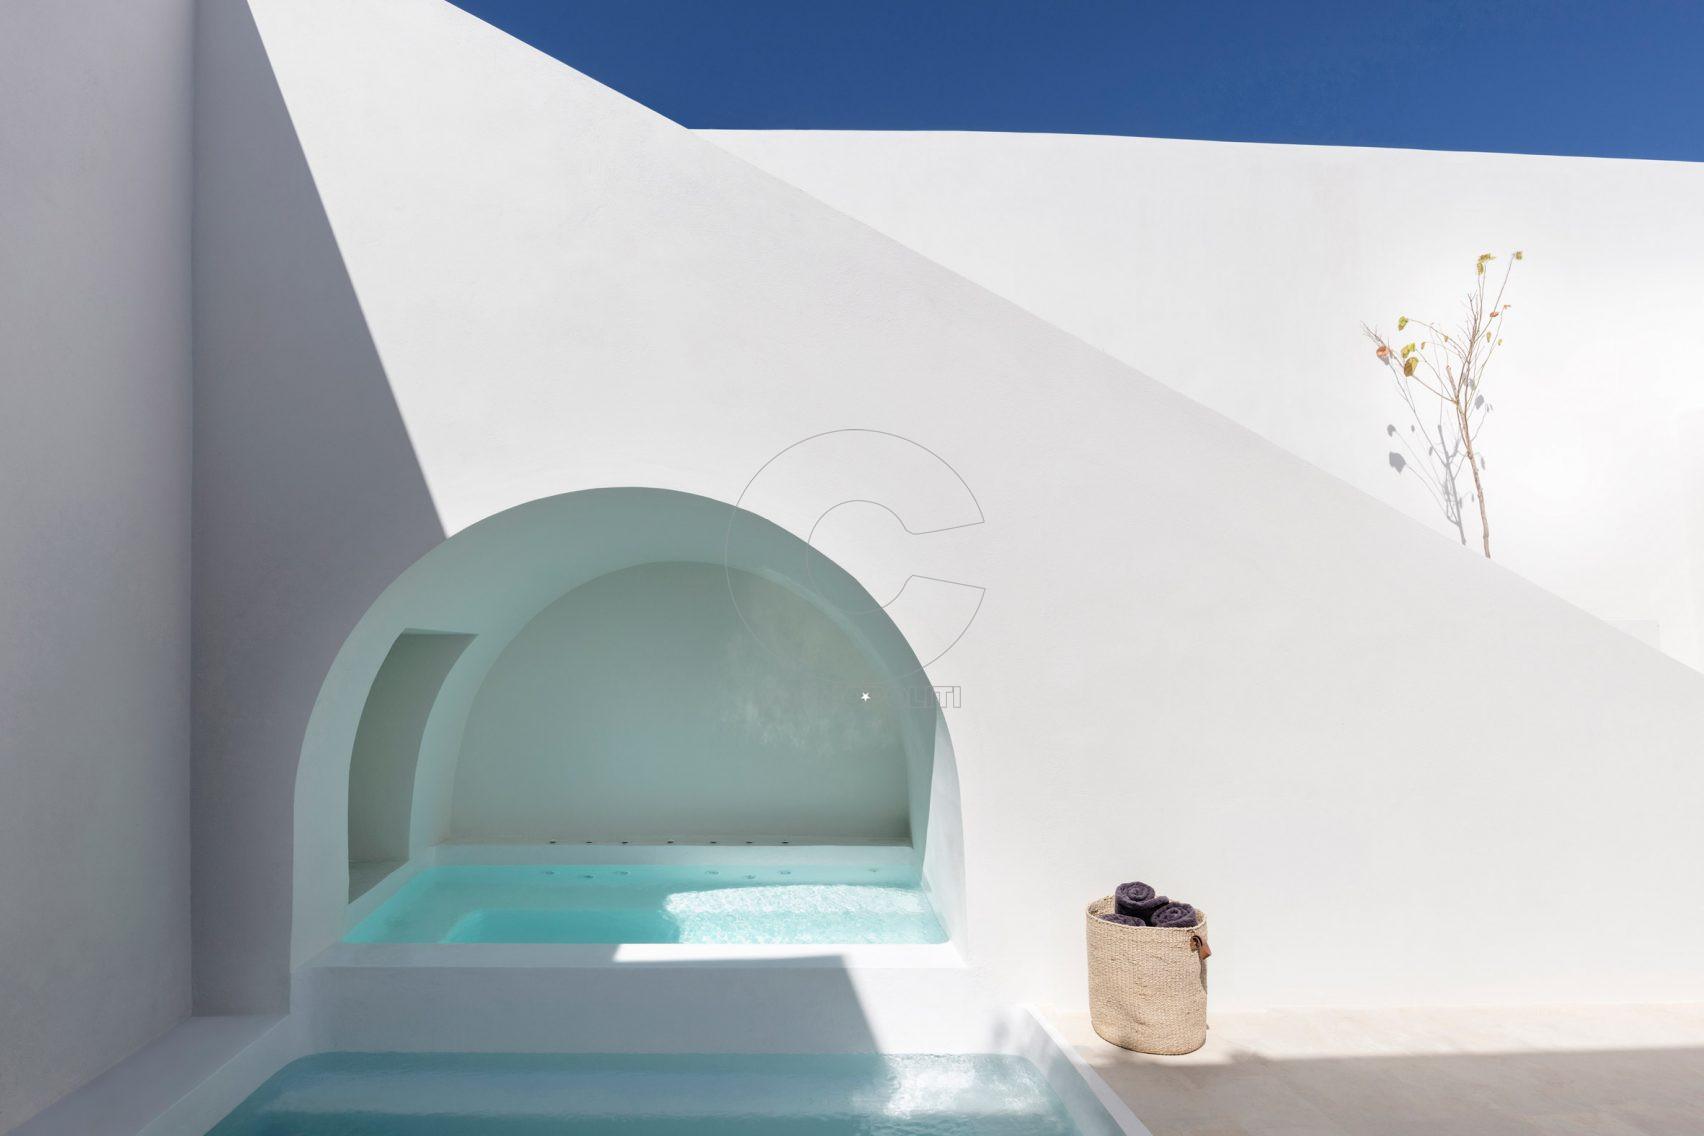 two-holiday-residences-fira-kapsimalis-architects-santorini-greece_dezeen_2364_col_5-1704x1136